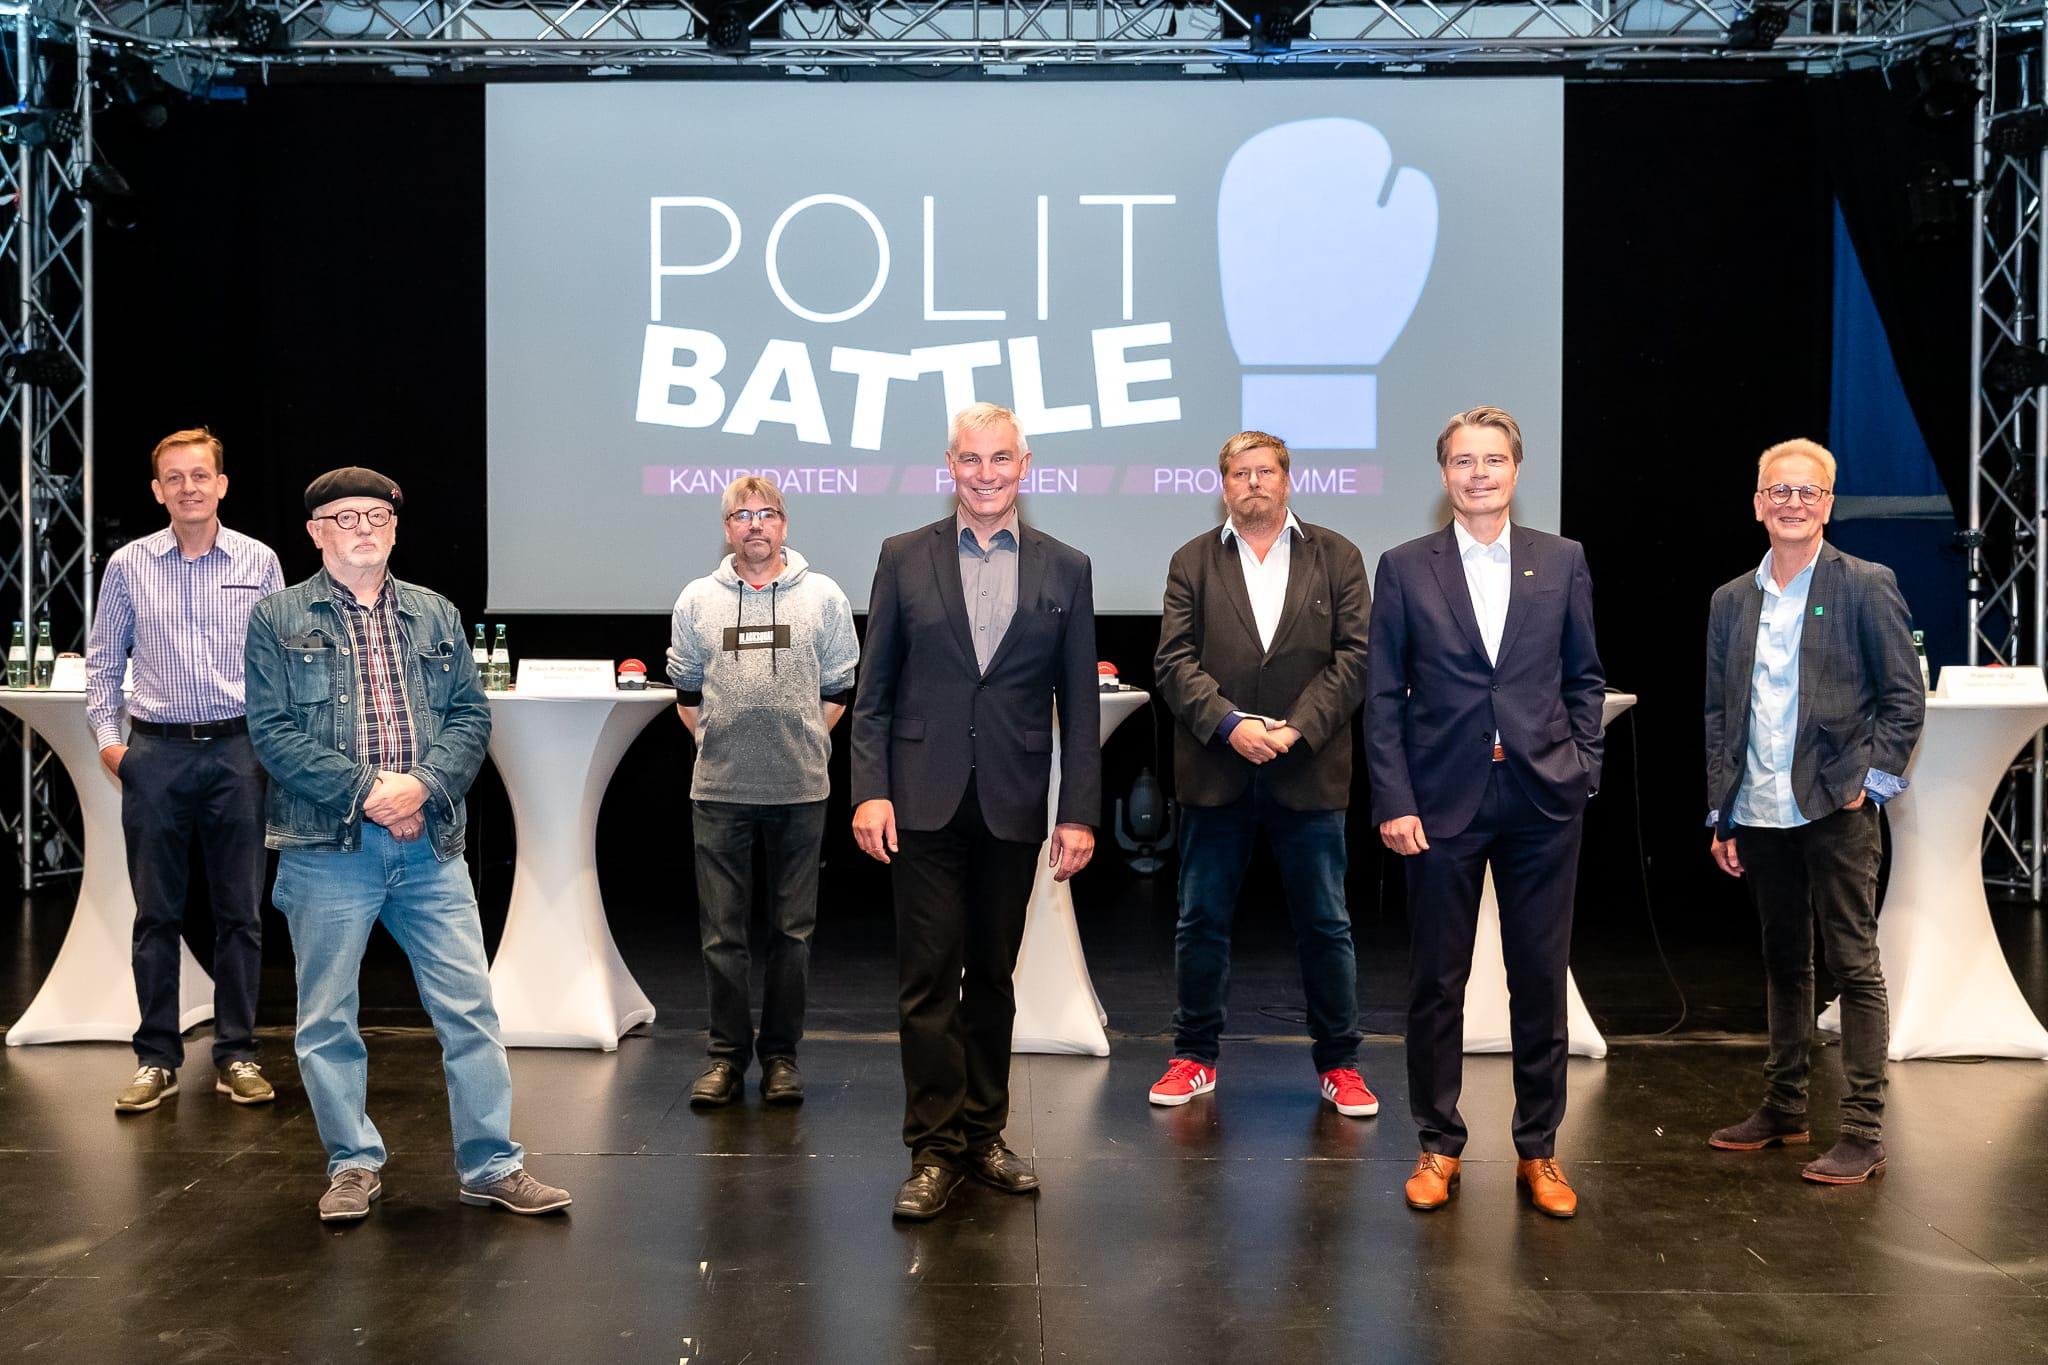 jugendrat-ratingen-politbattle-2020-kandidaten